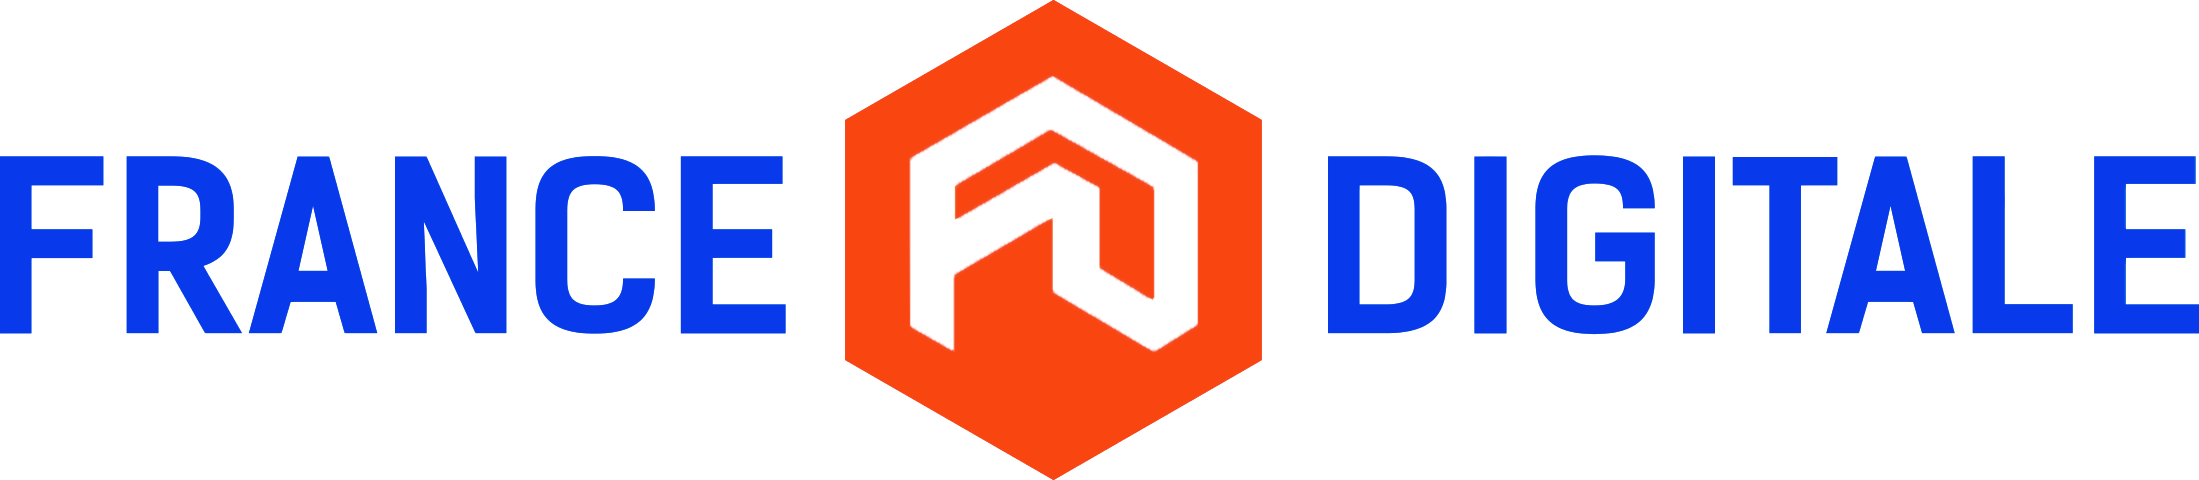 fd_logo_color